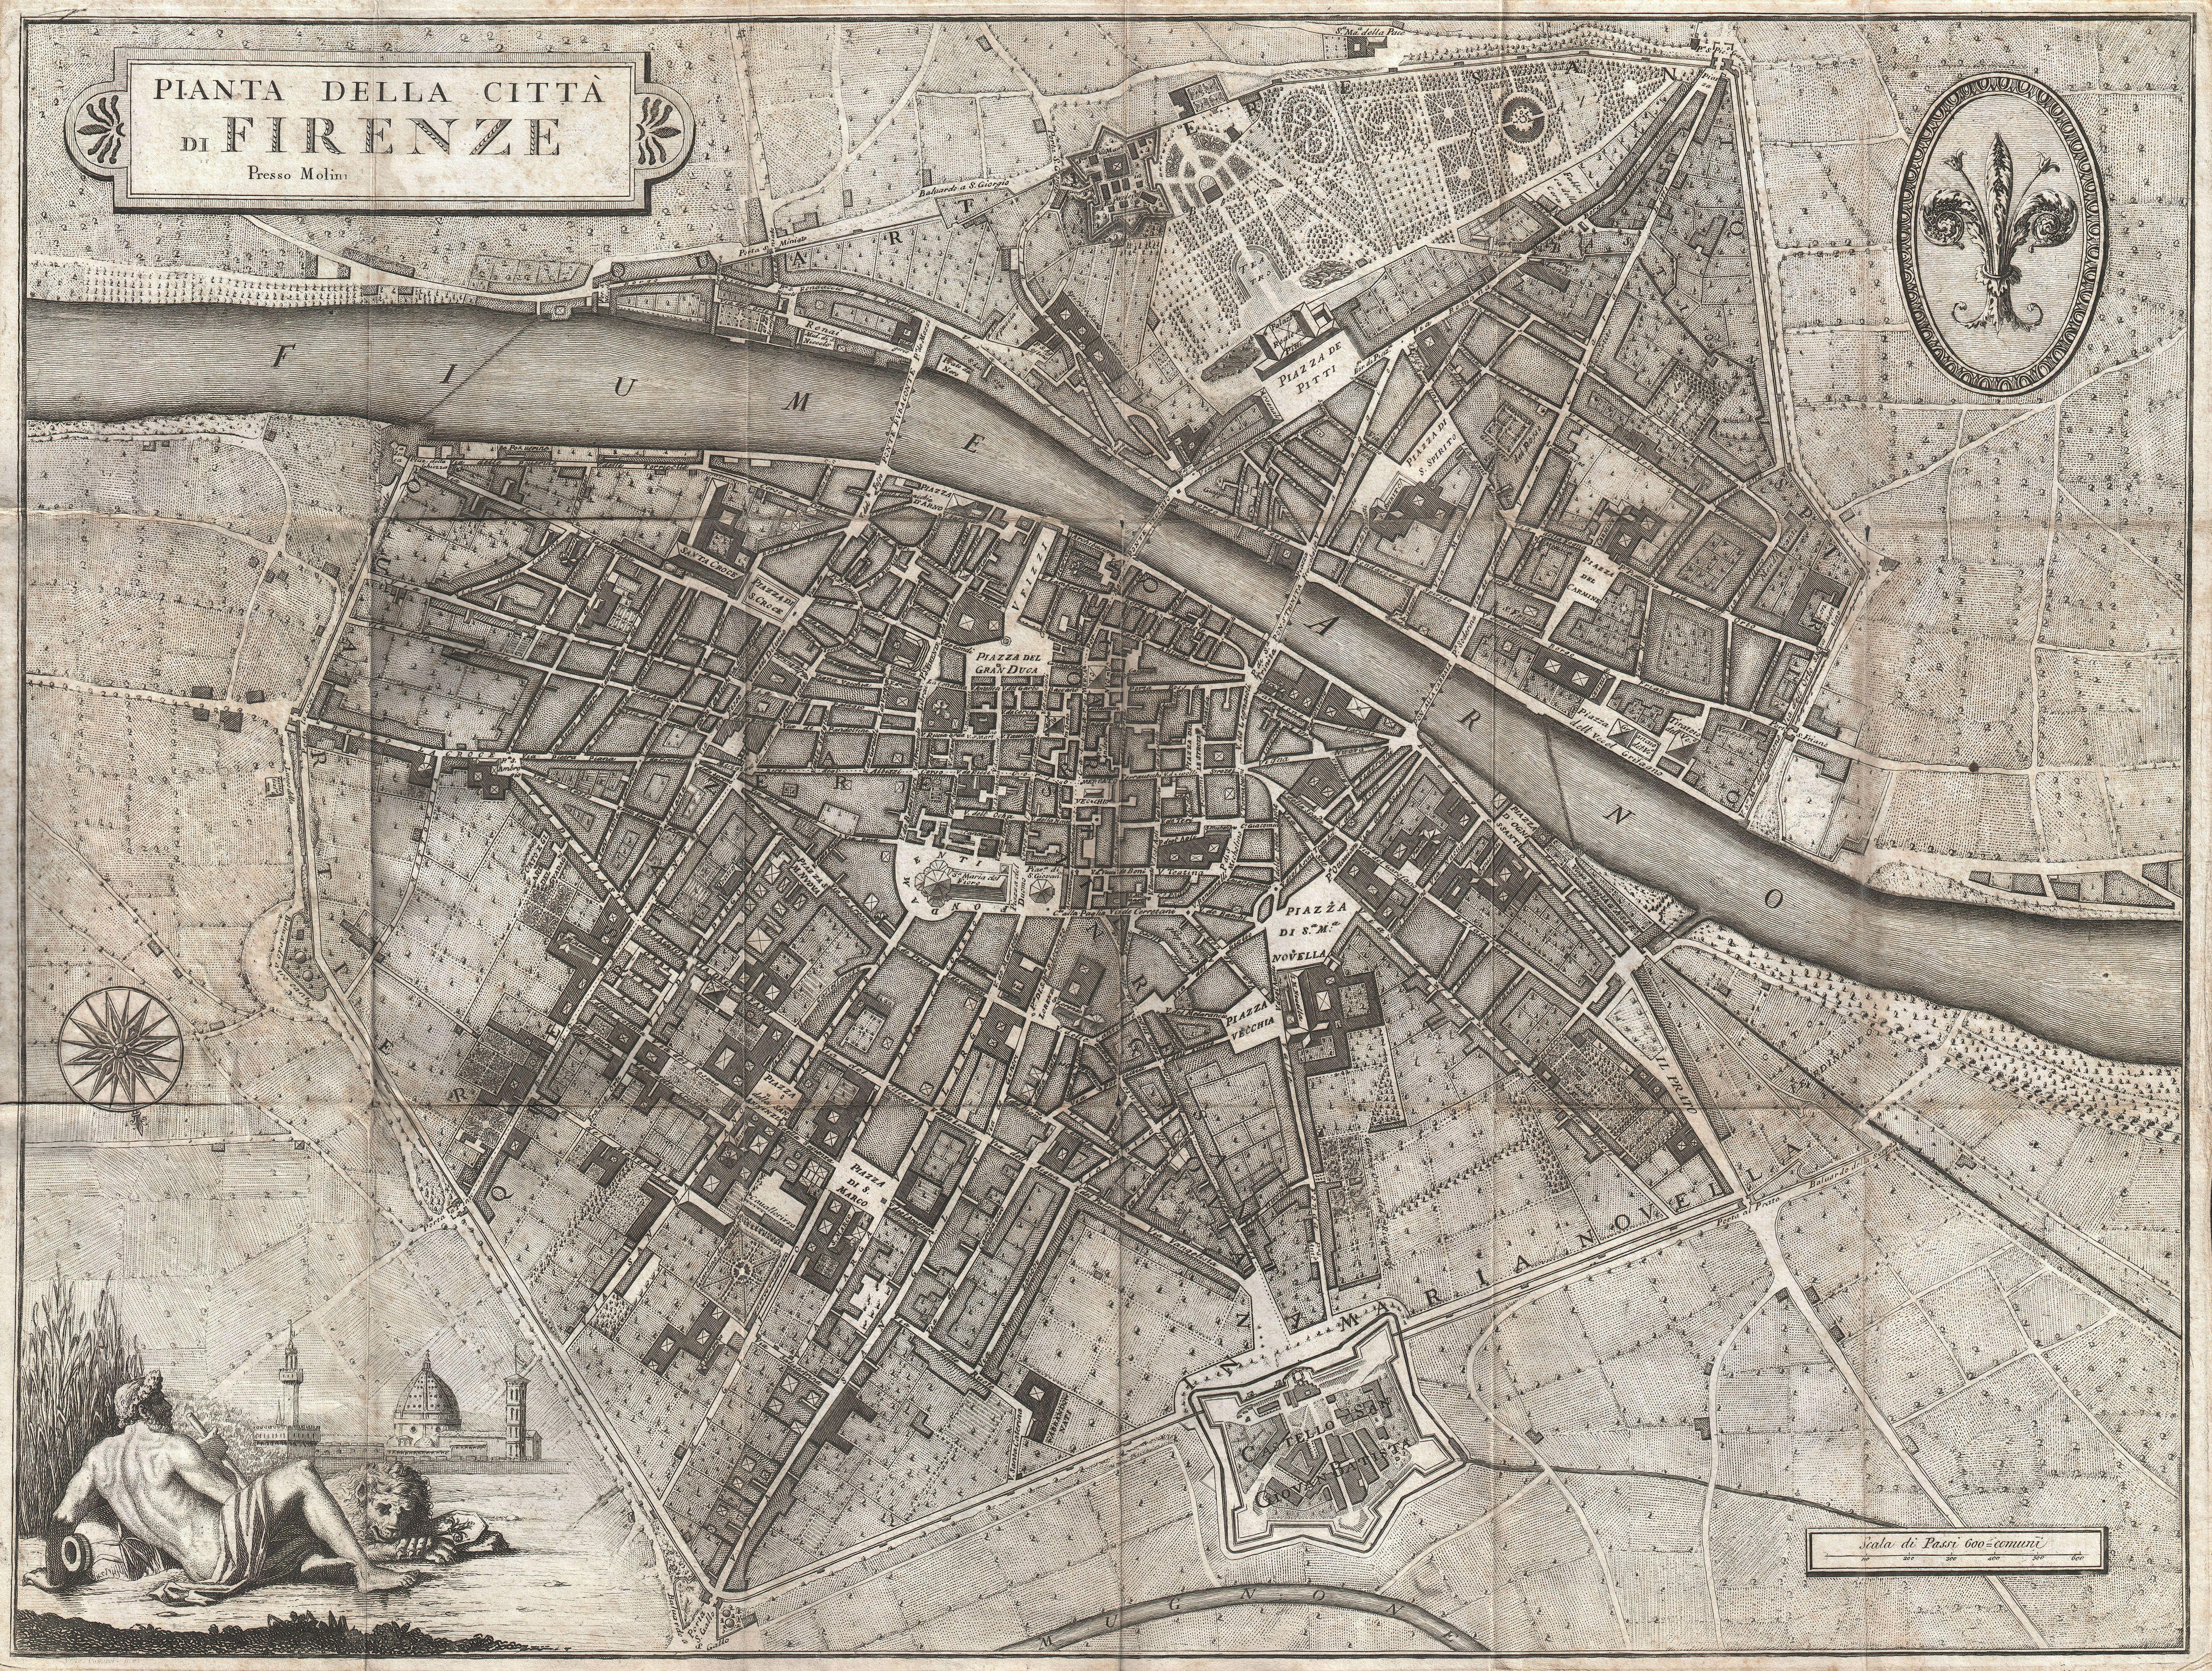 historical maps of florence alabama mall - photo#5